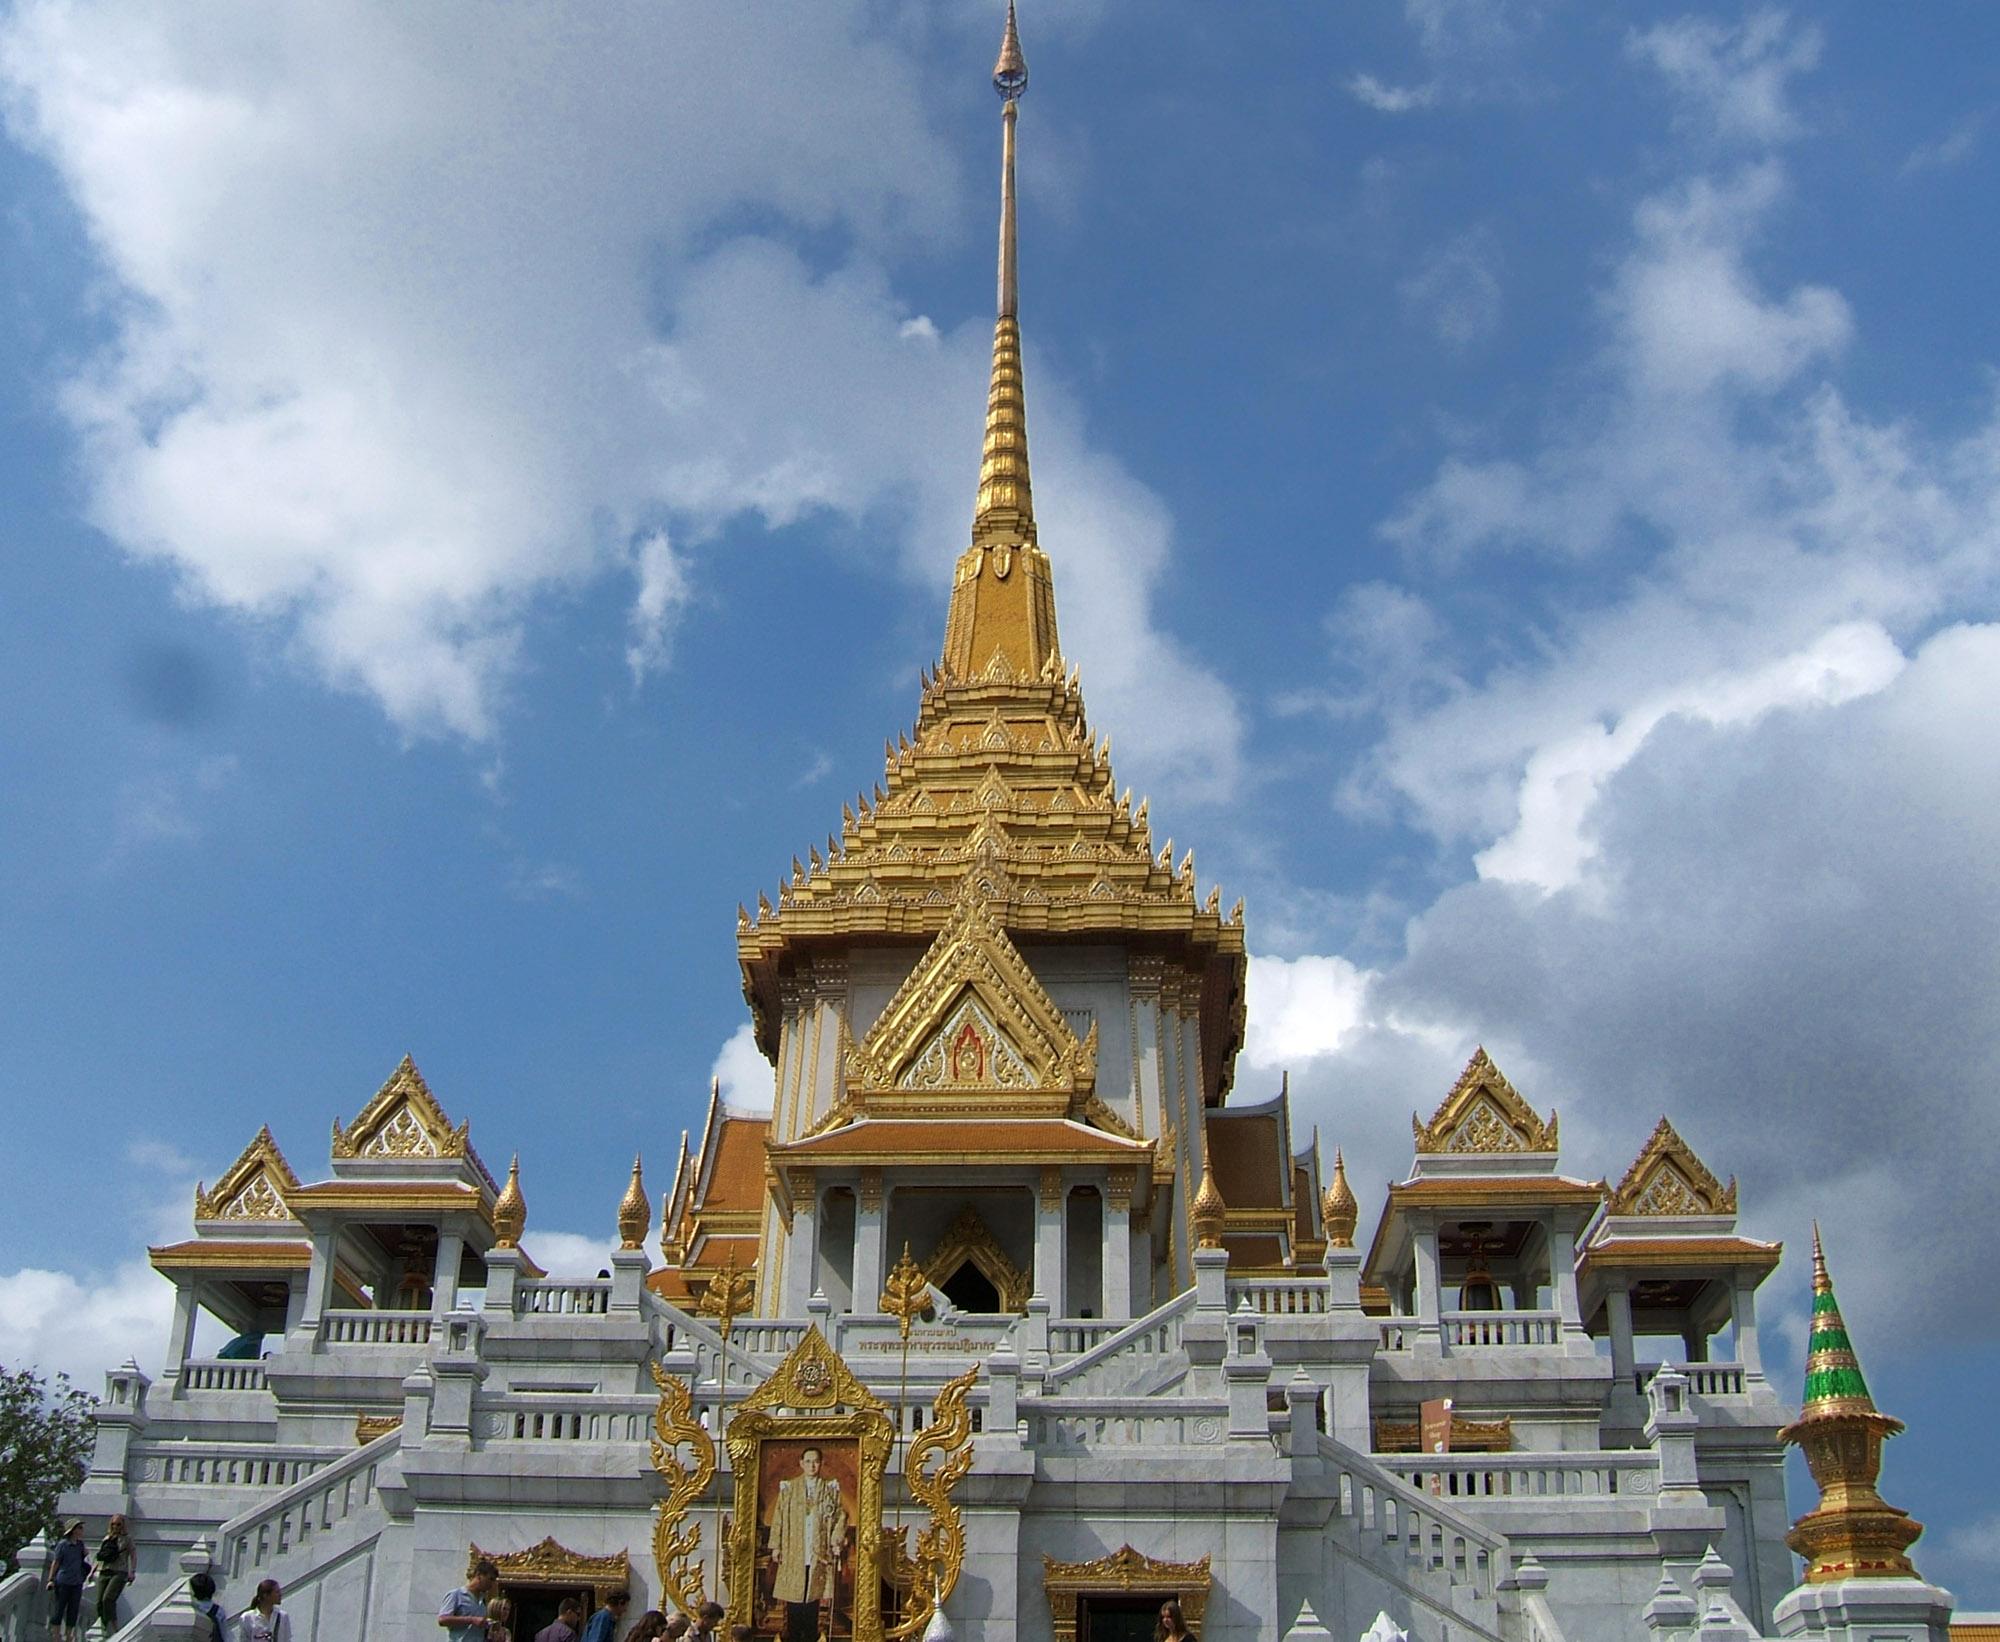 Wat Traimit home of the Golden Buddha in Bangkok, Thailand